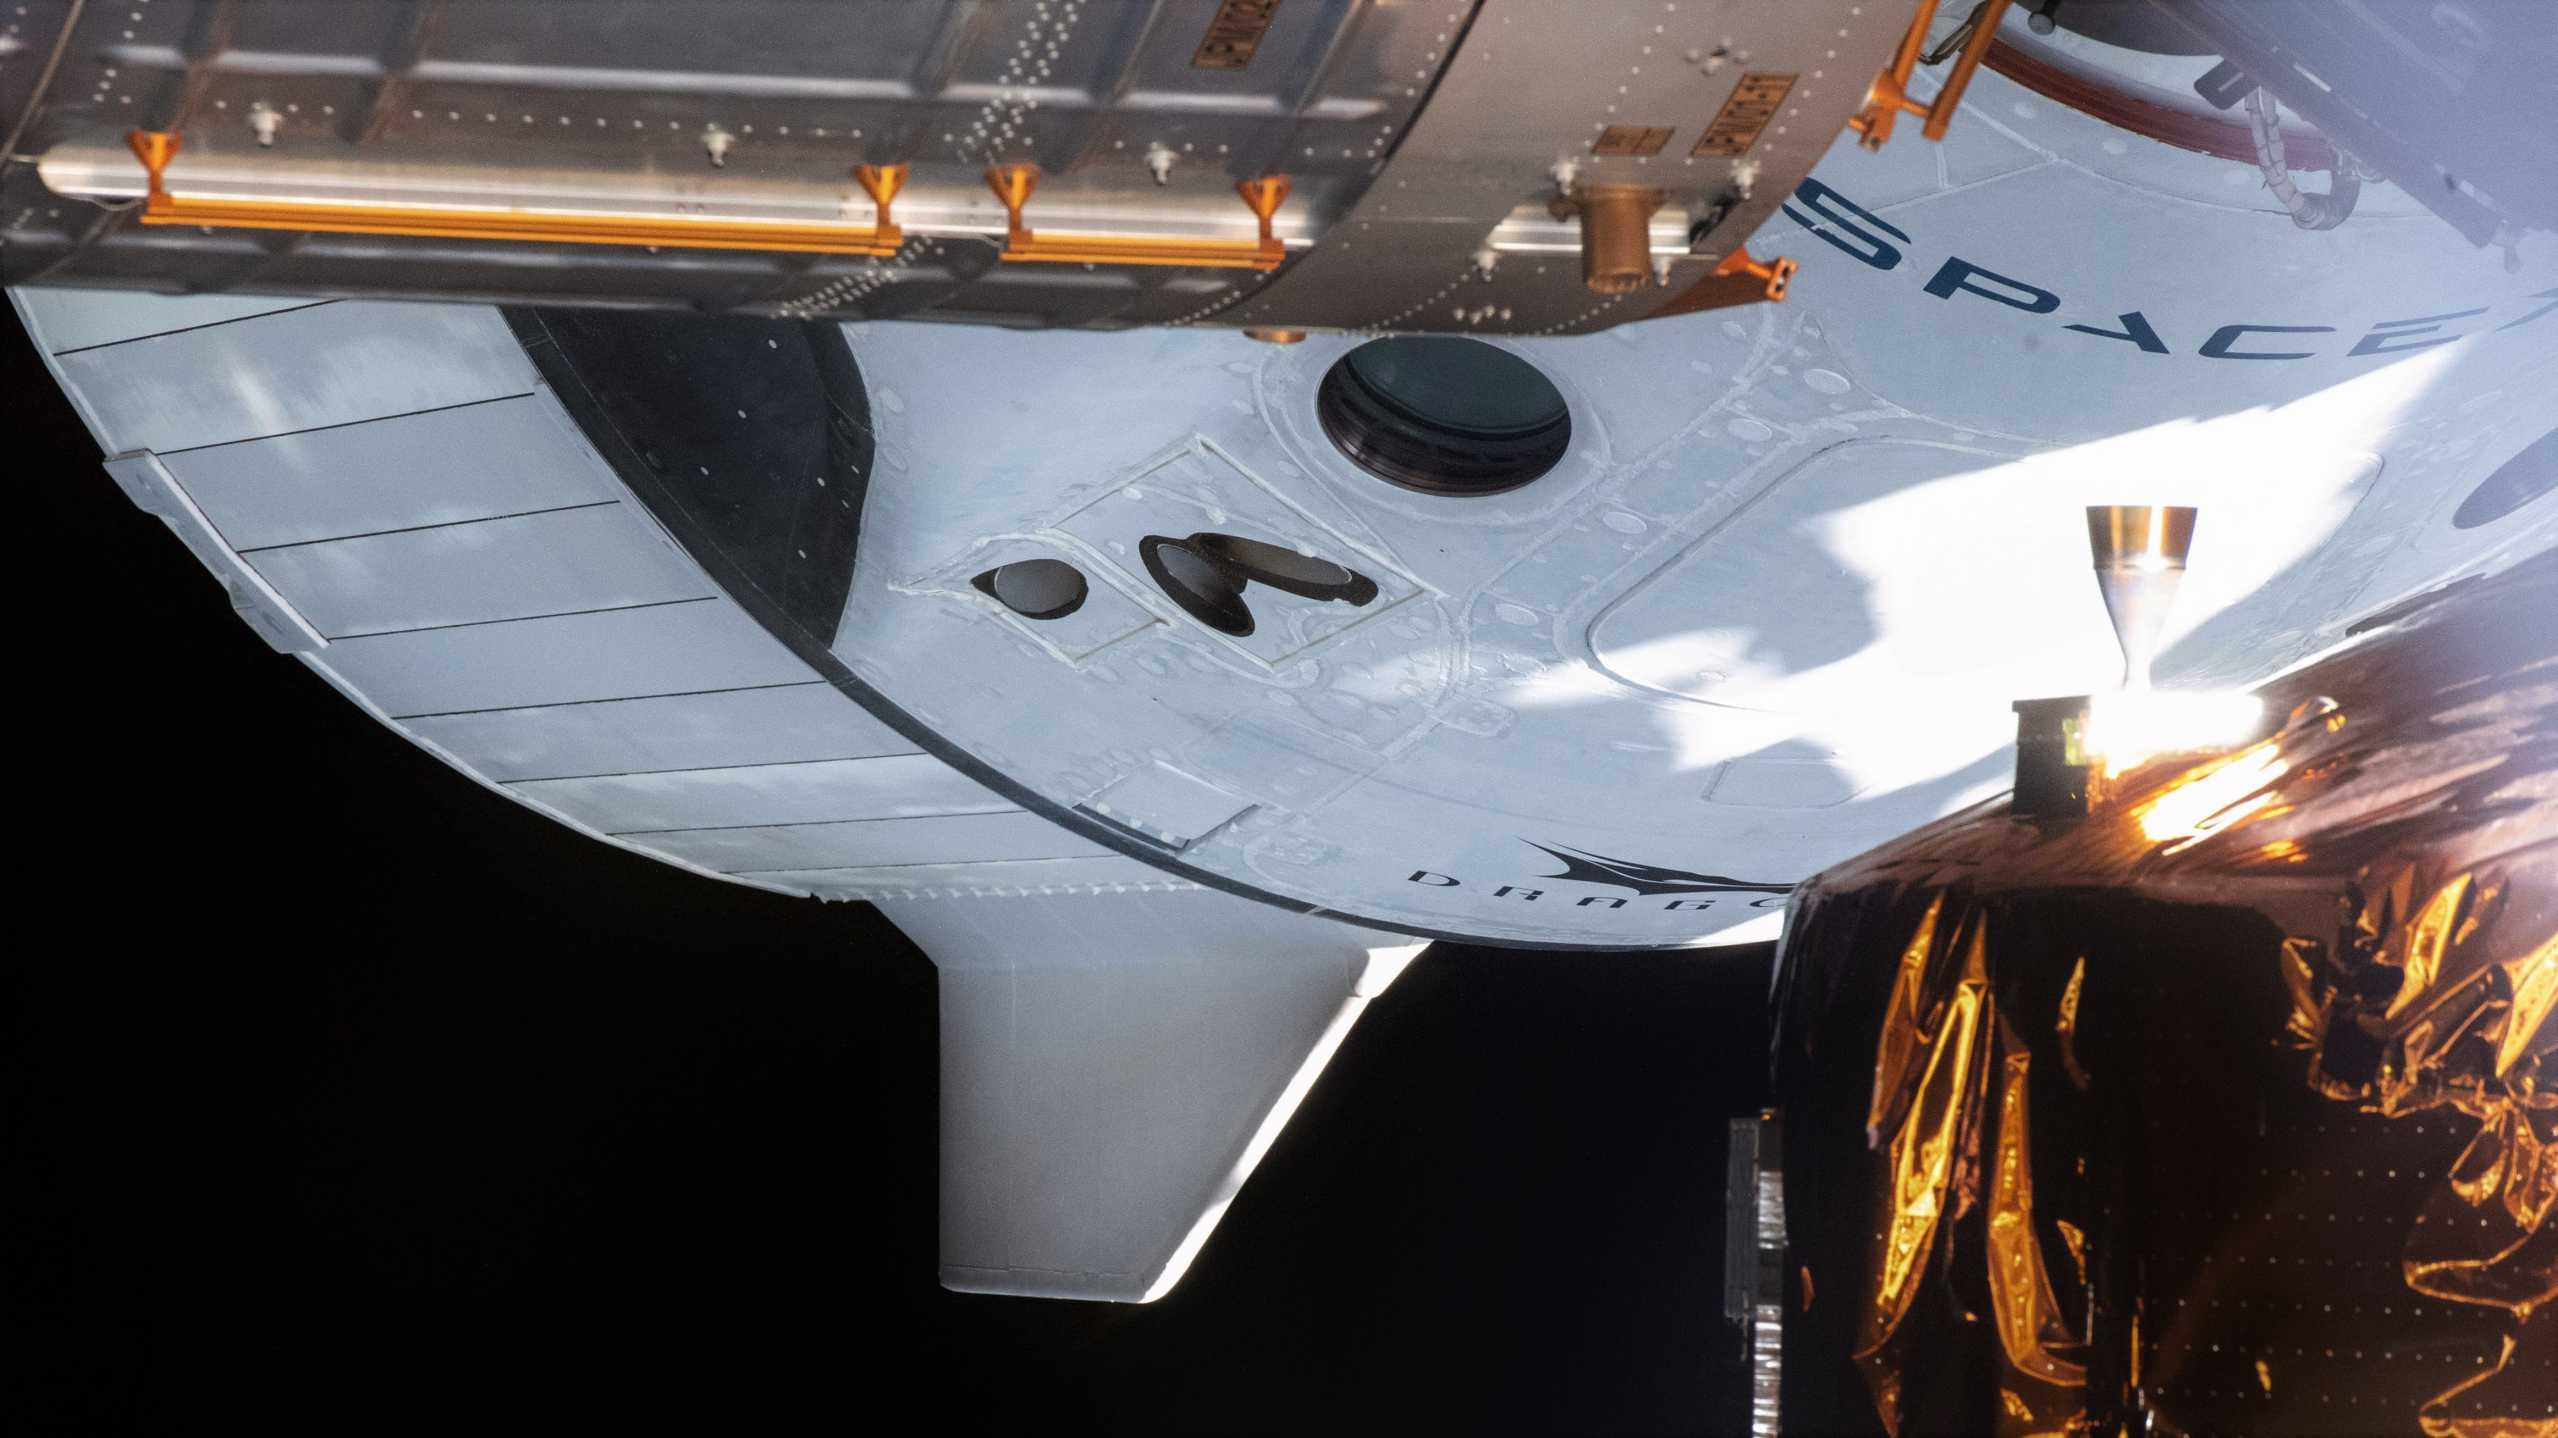 Crew Dragon C206 Demo-2 ISS 060820 (NASA) 1 crop 3 (c)